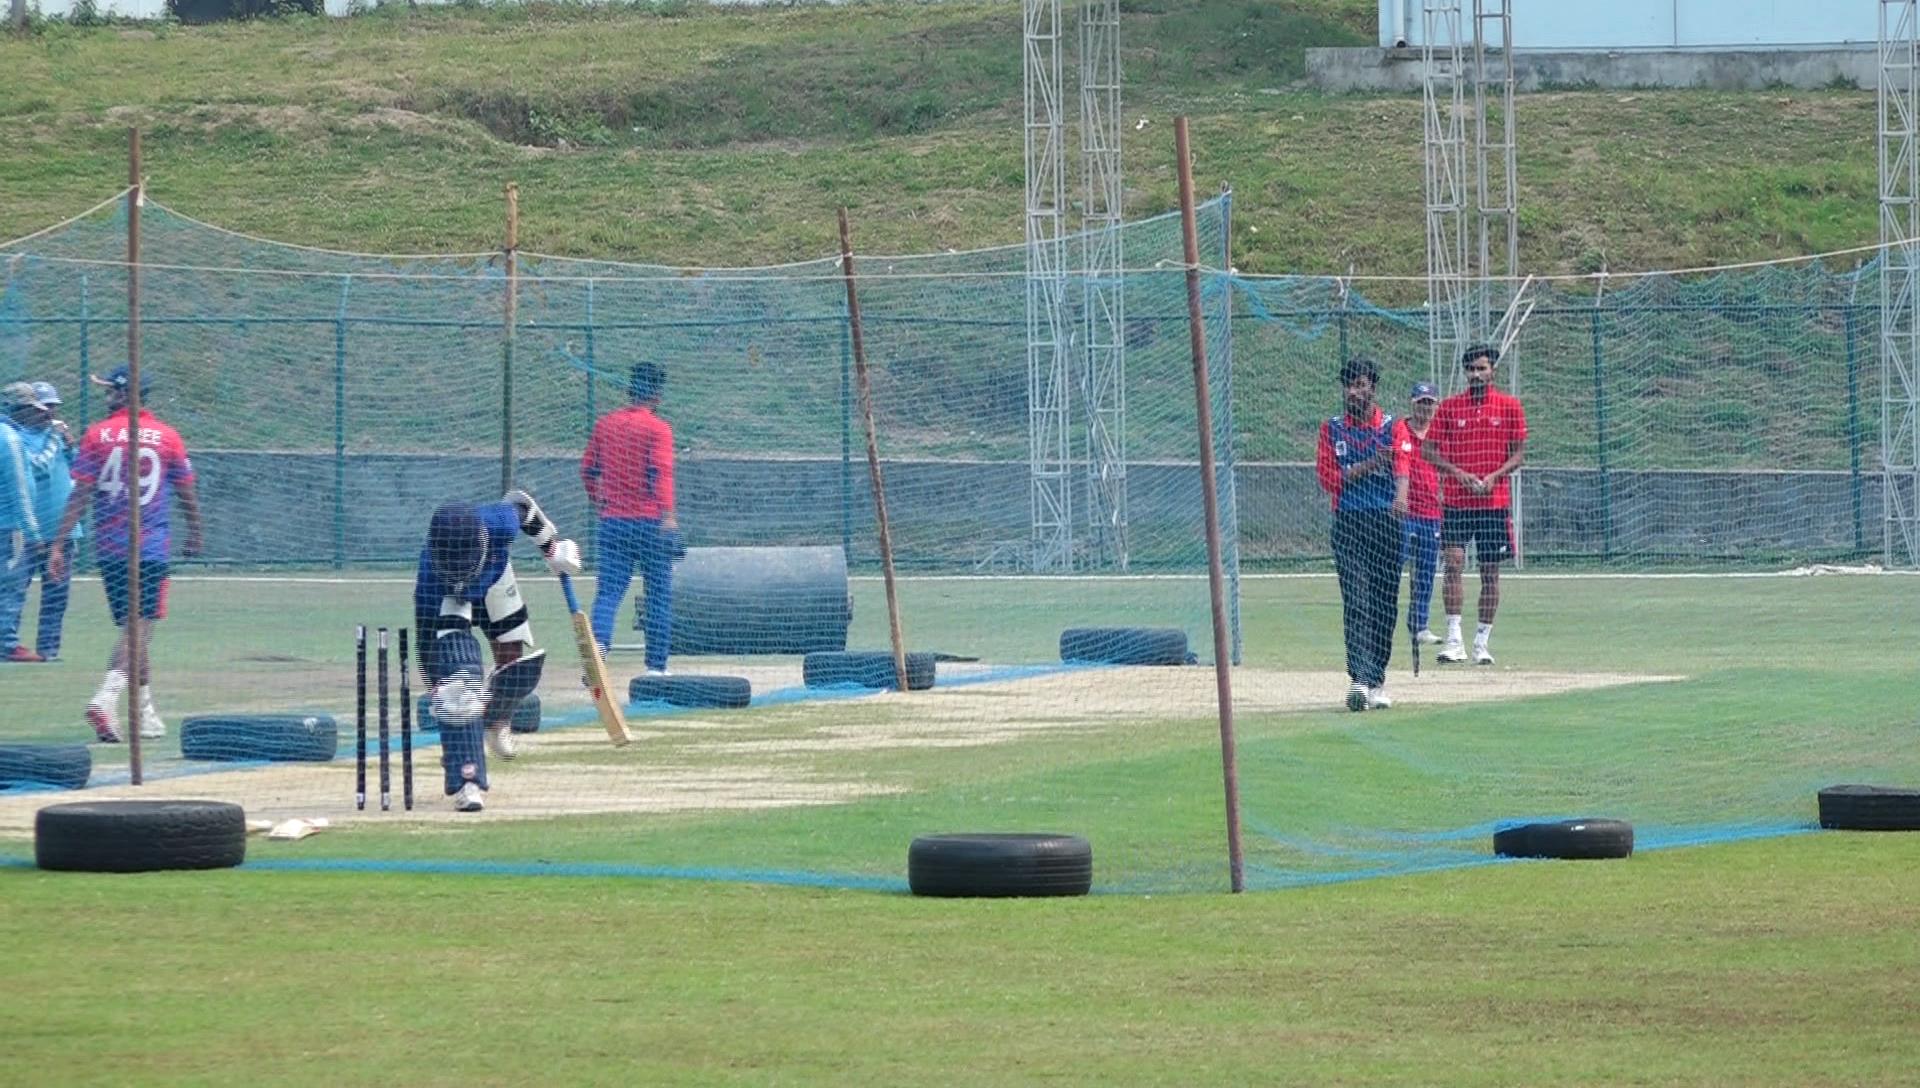 त्रिकाेणात्मक टी-२० क्रिकेट भाेलीदेखि, दर्शक प्रवेशमा ठूलाे अन्याेल